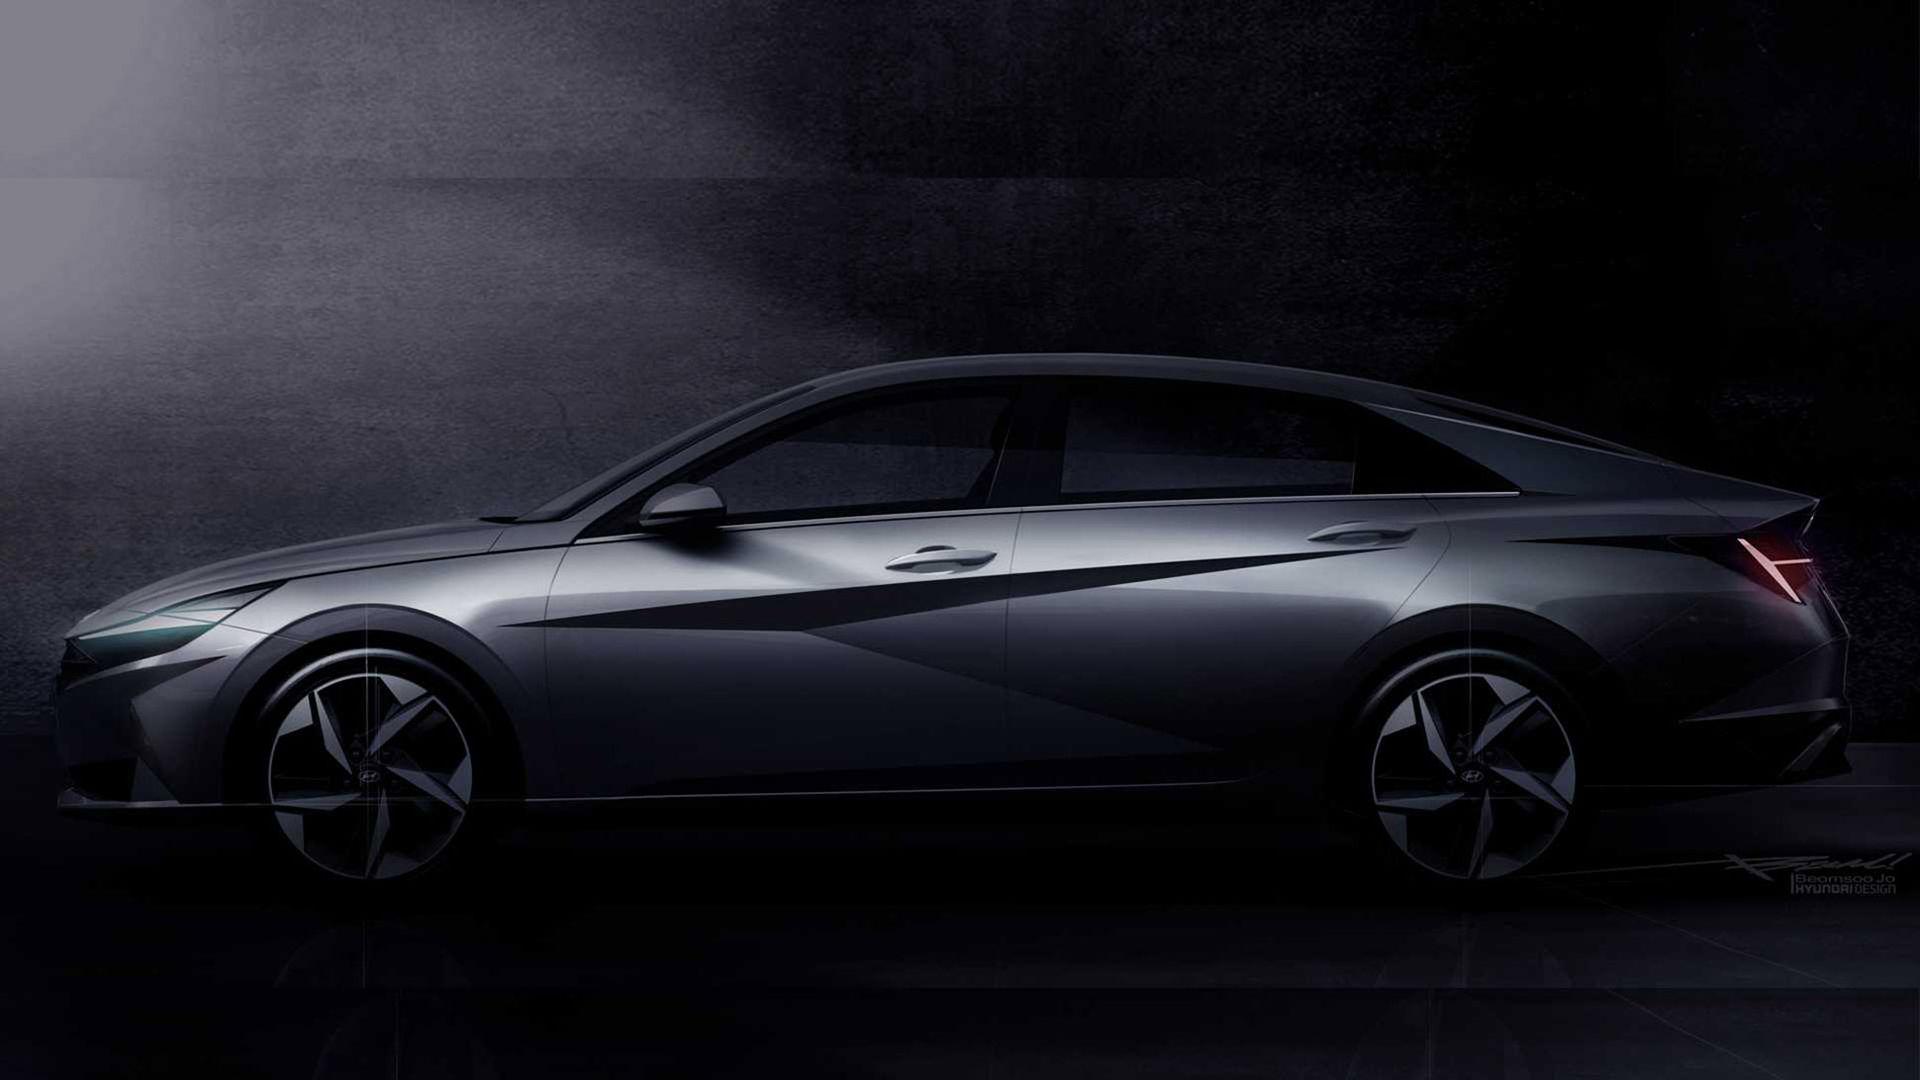 Teasers för nya Hyundai Elantra